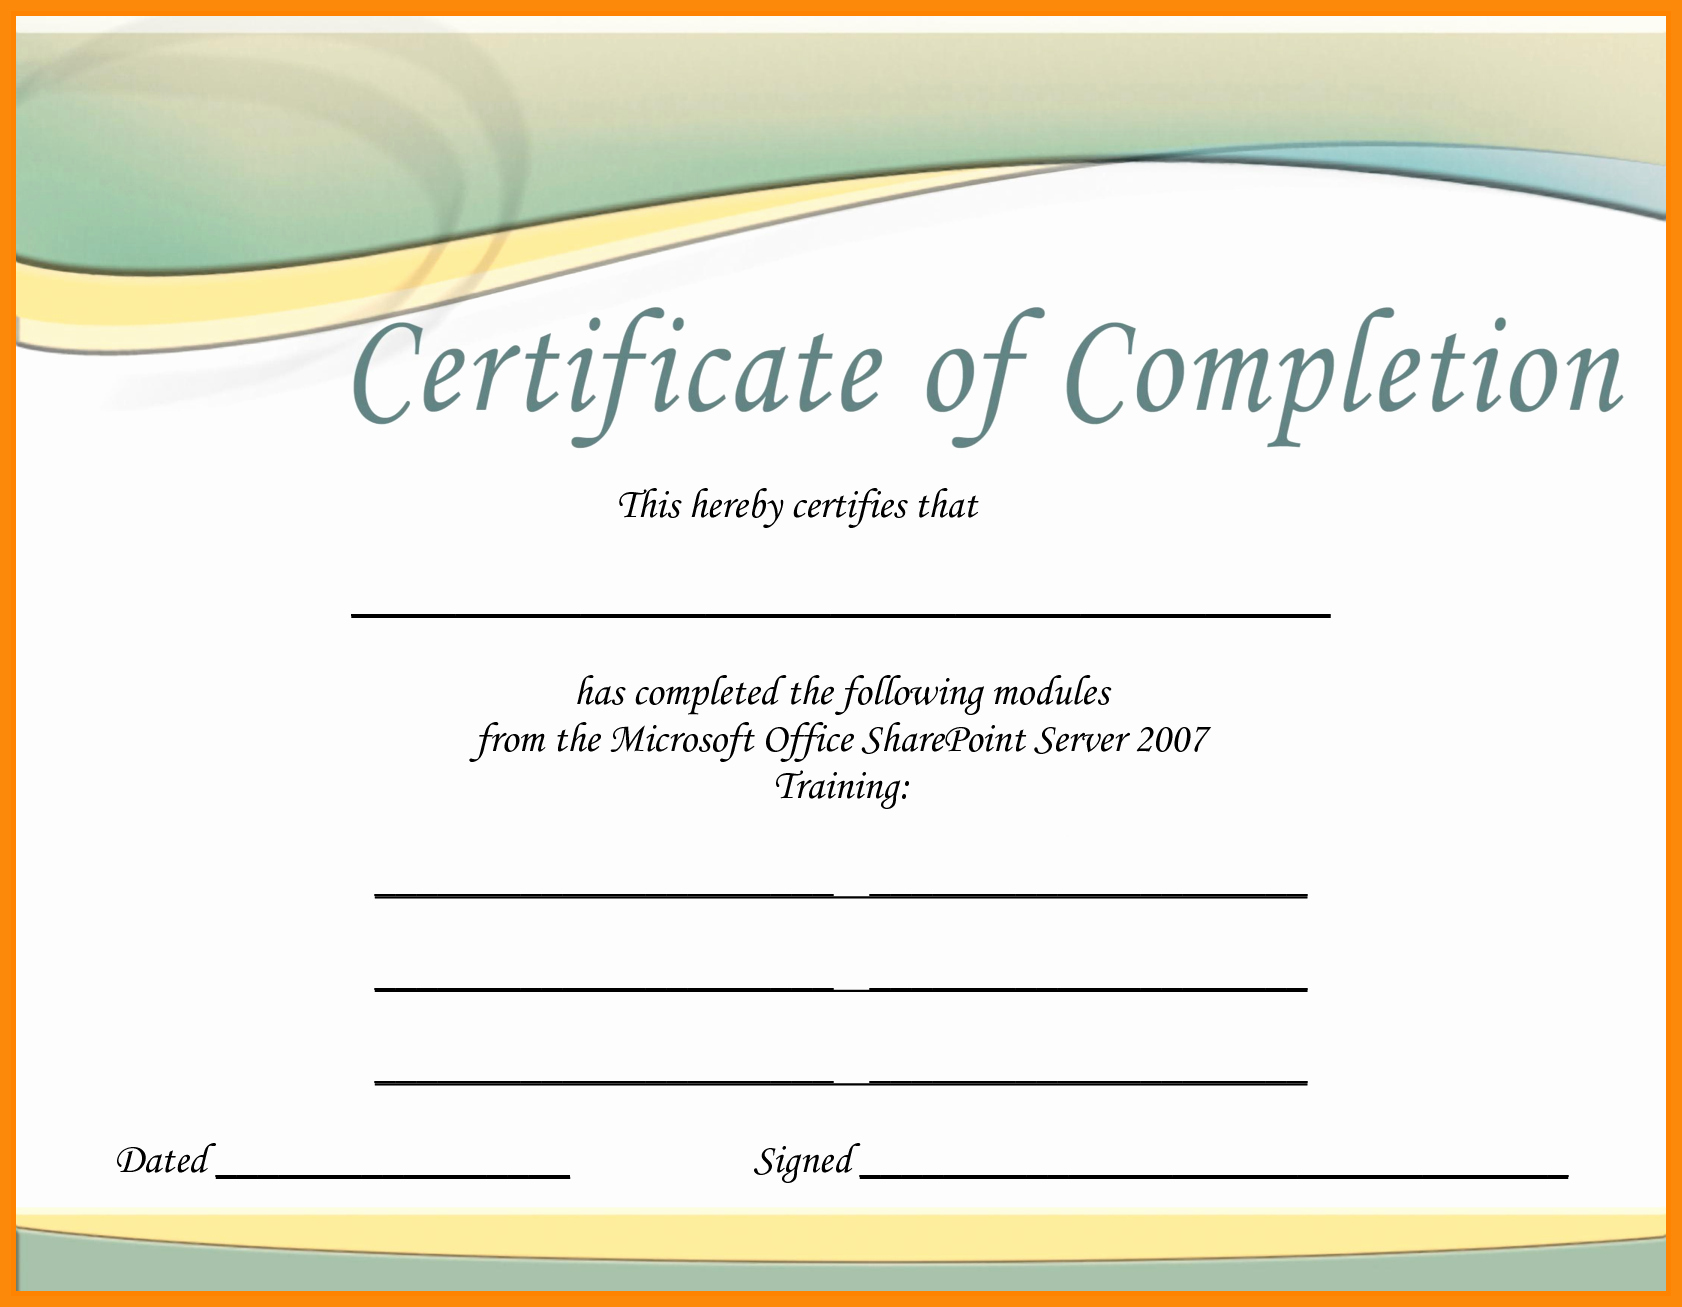 Microsoft Office Award Certificate Template Lovely Microsoft Award Templates Portablegasgrillweber